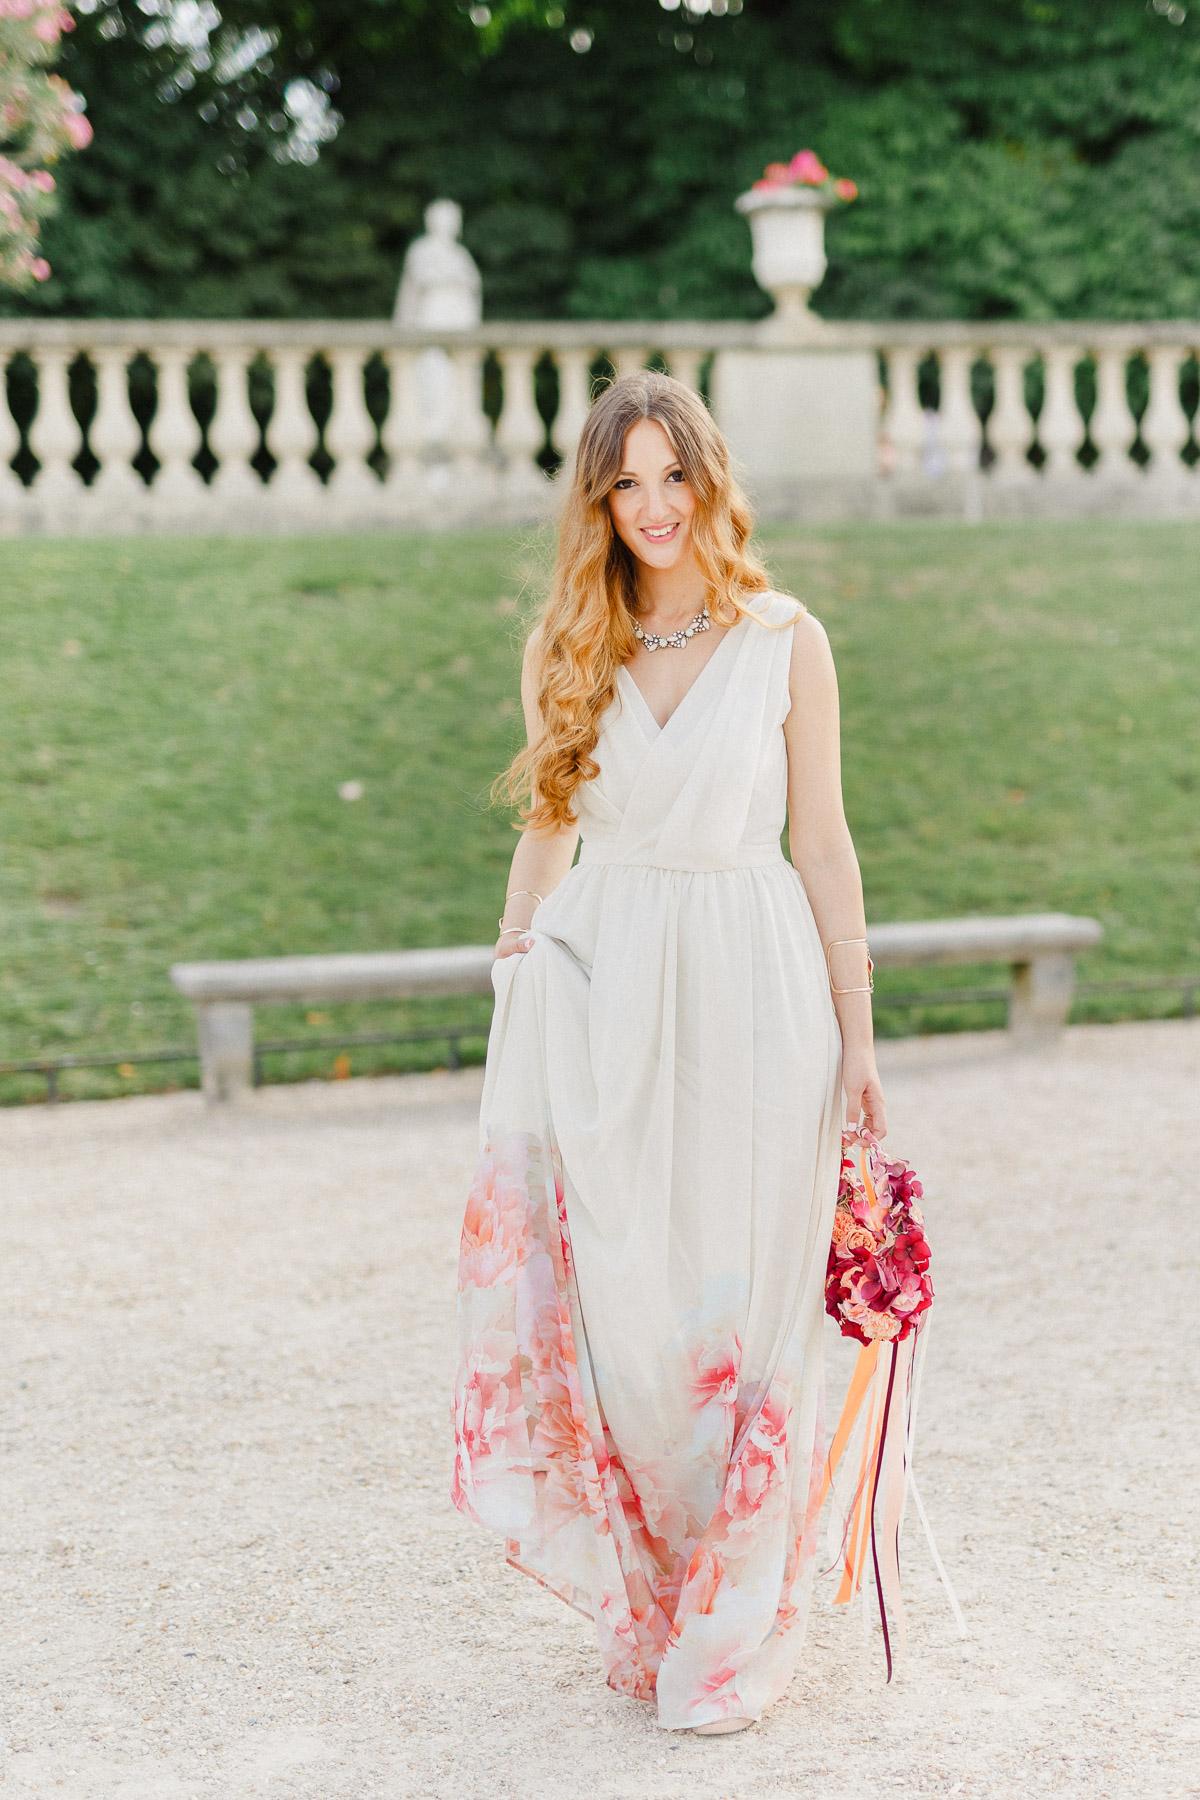 Kleid bodenlang Blumenprint